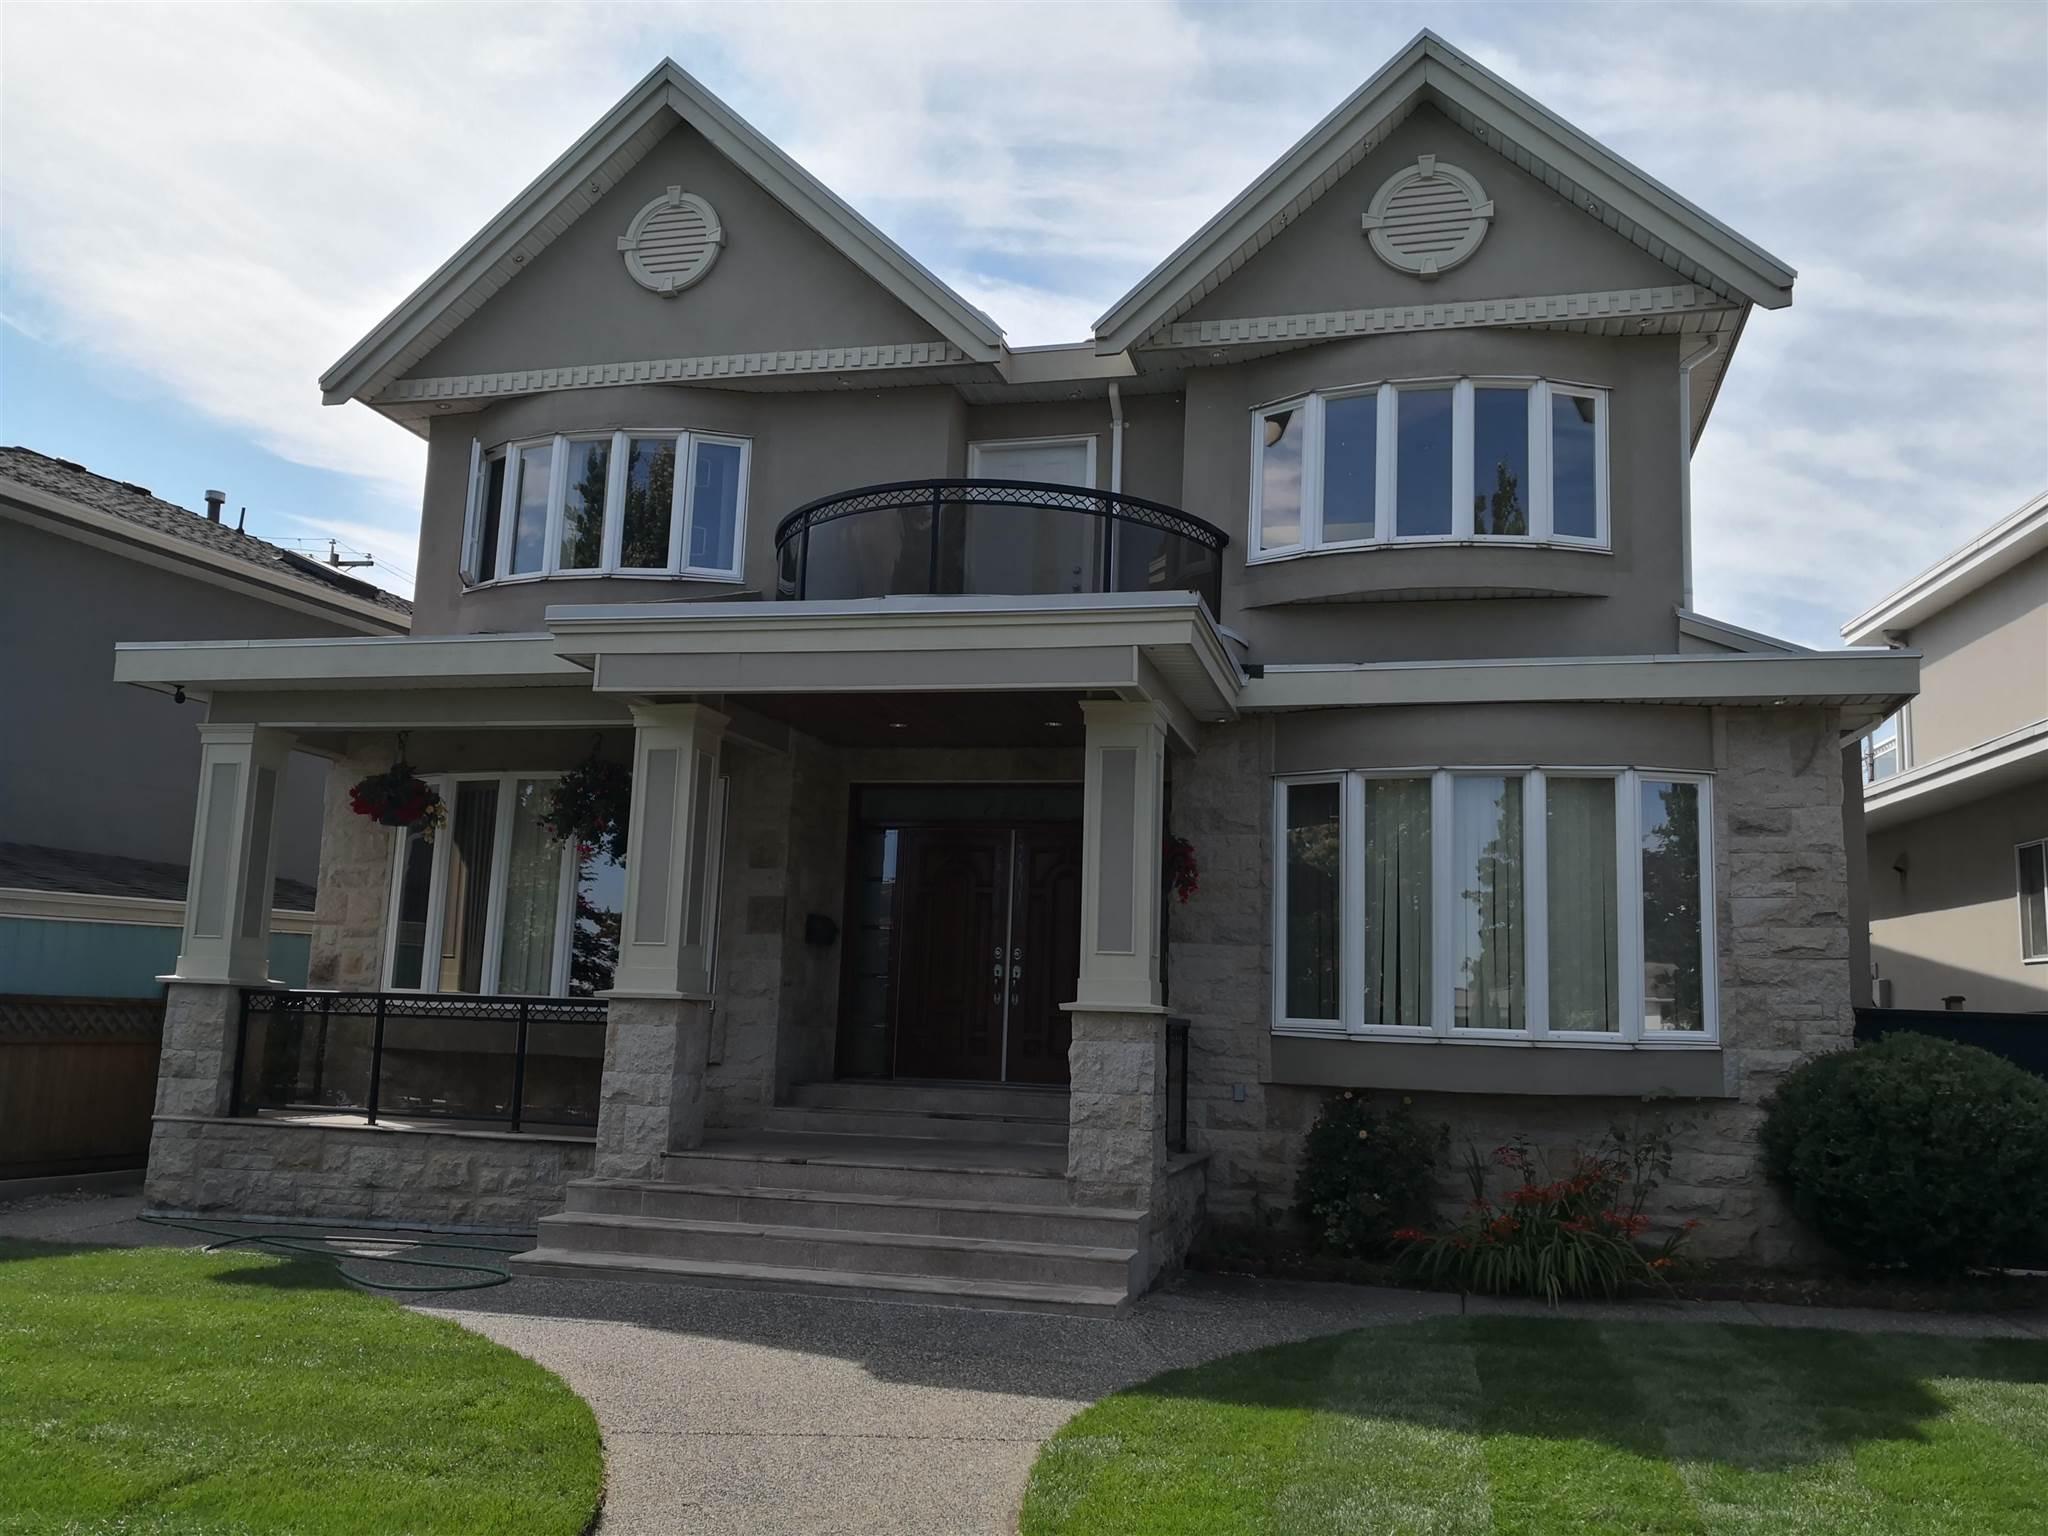 7229 ASHBURN STREET - Fraserview VE House/Single Family for sale, 8 Bedrooms (R2600894) - #1